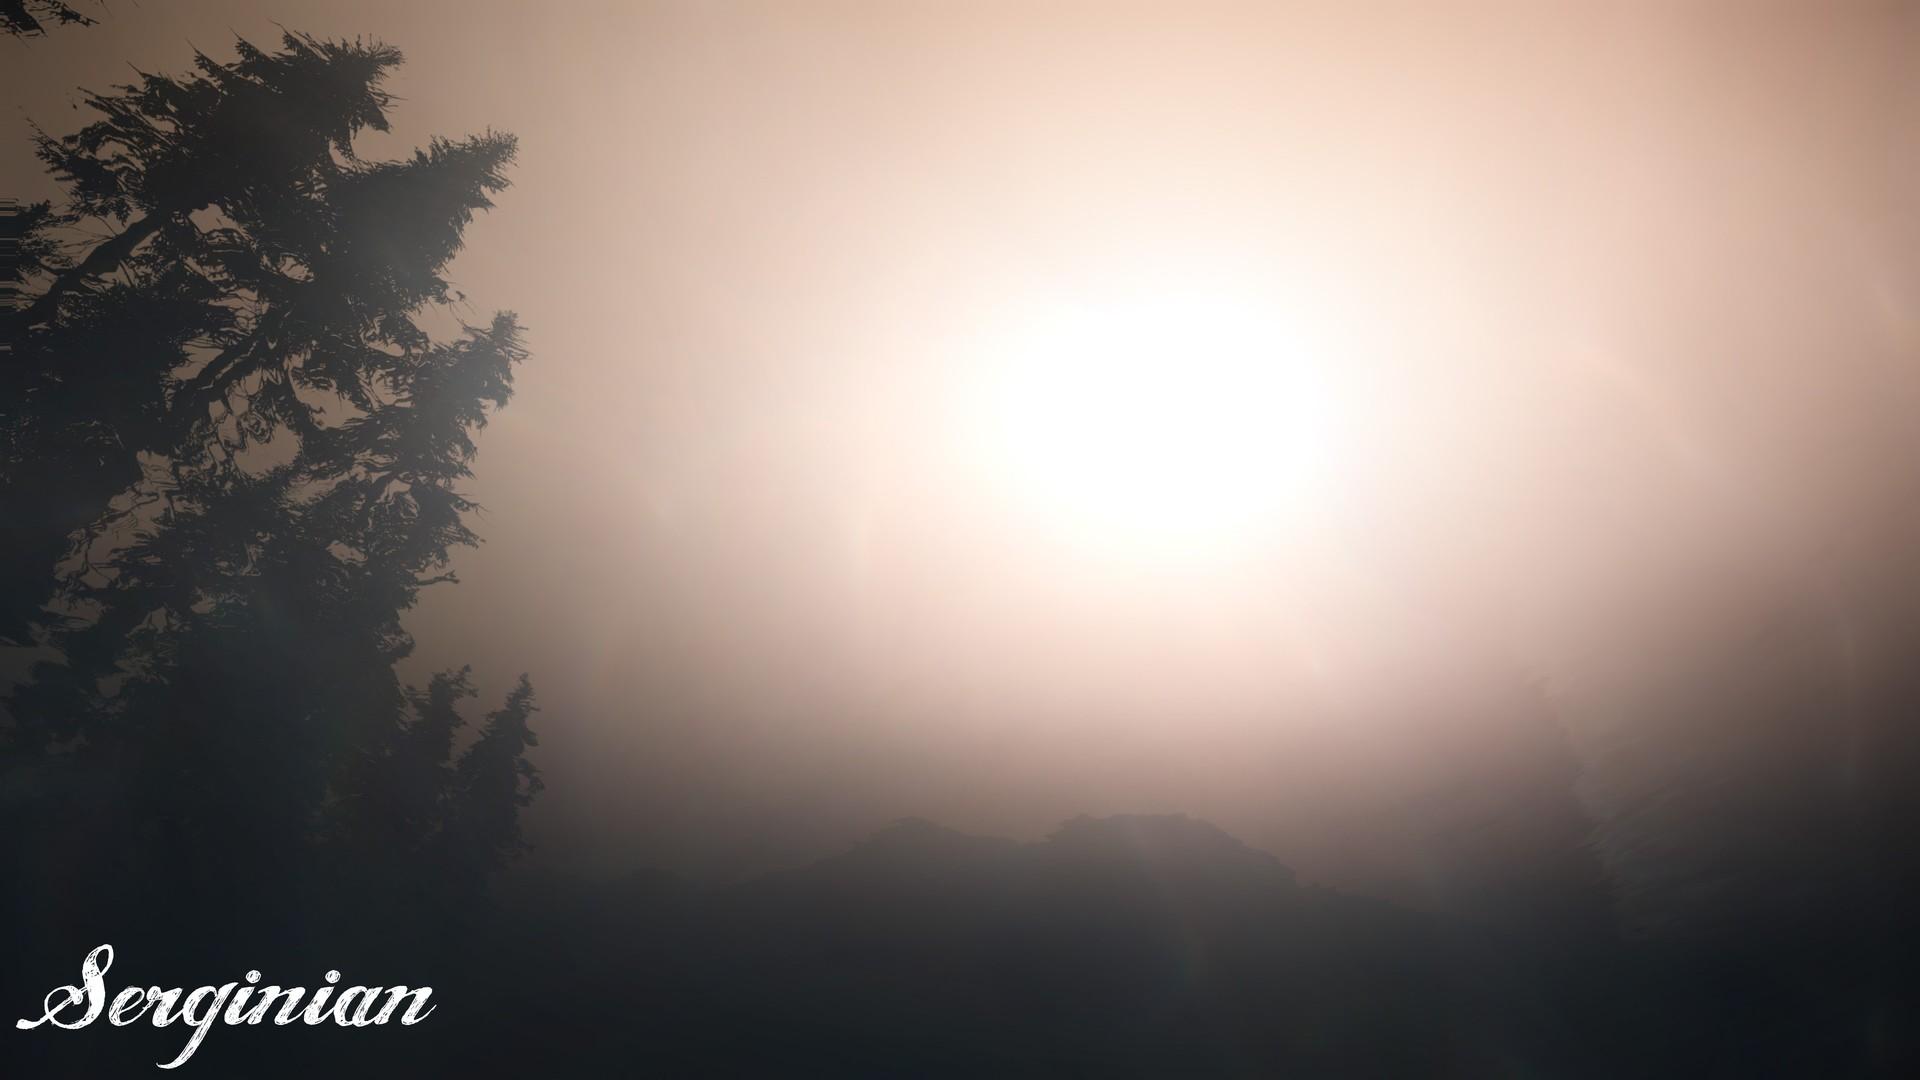 Sergei aparin screenshot0000